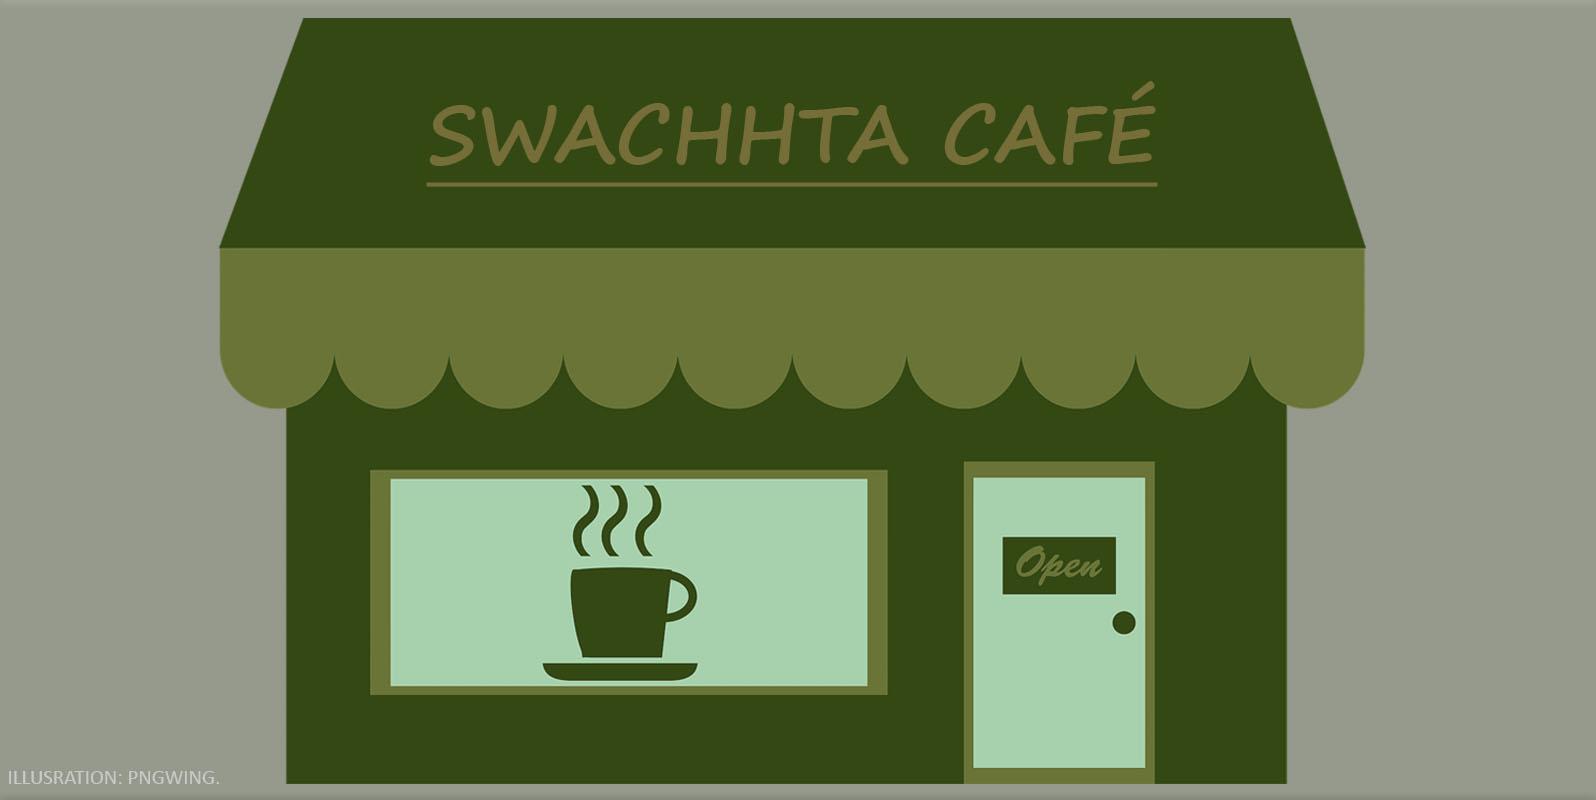 swachhta cafes in himachal pradesh